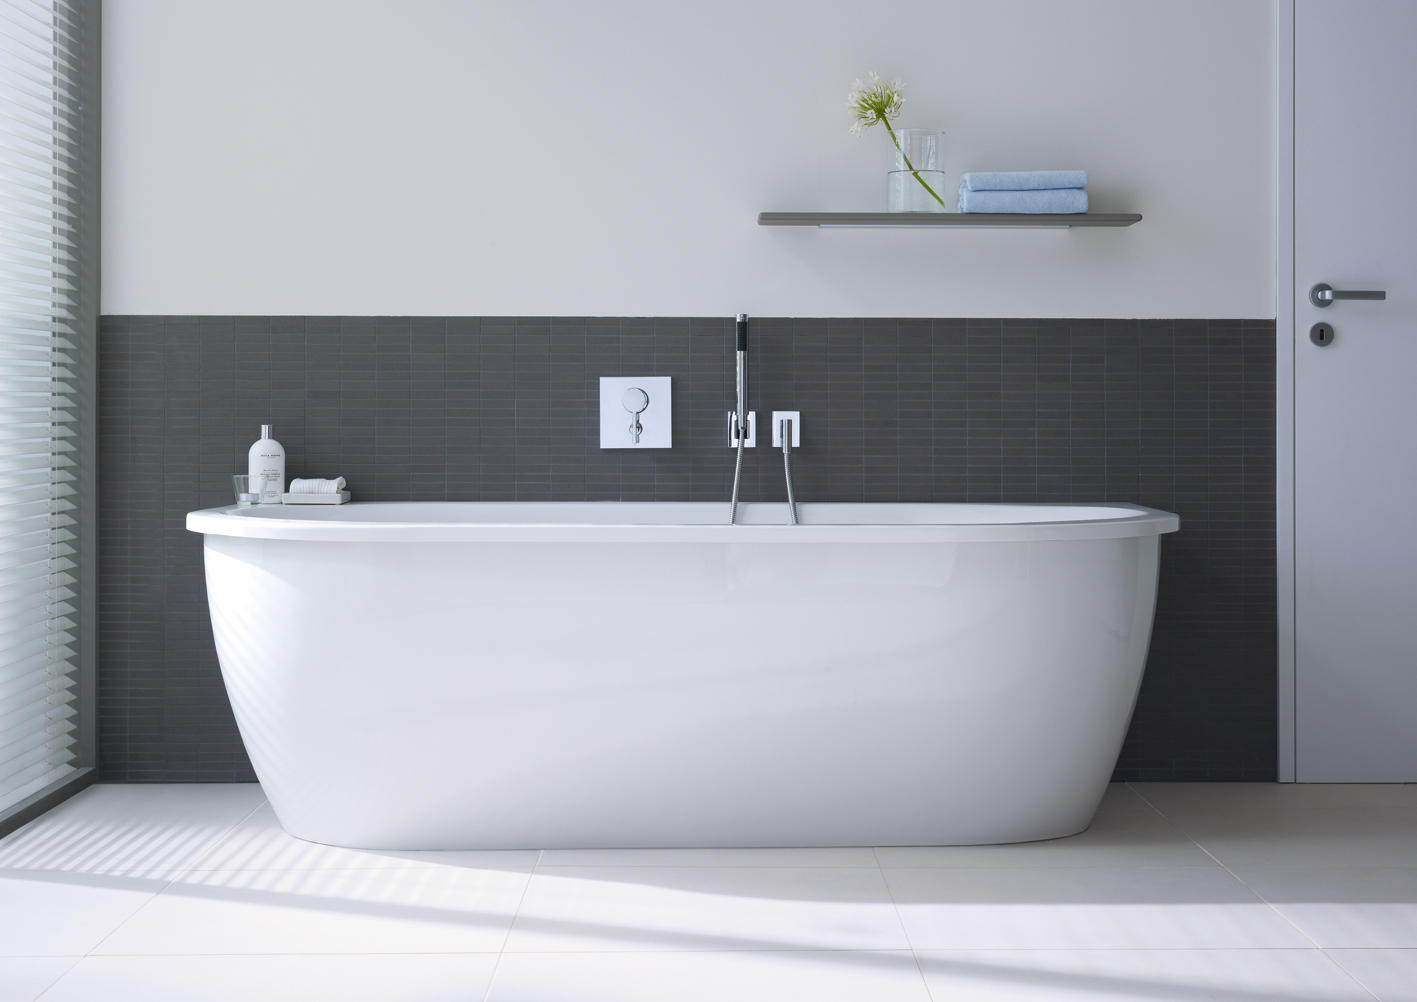 DARLING NEW - COLONNA - Mobili lavabo DURAVIT | Architonic